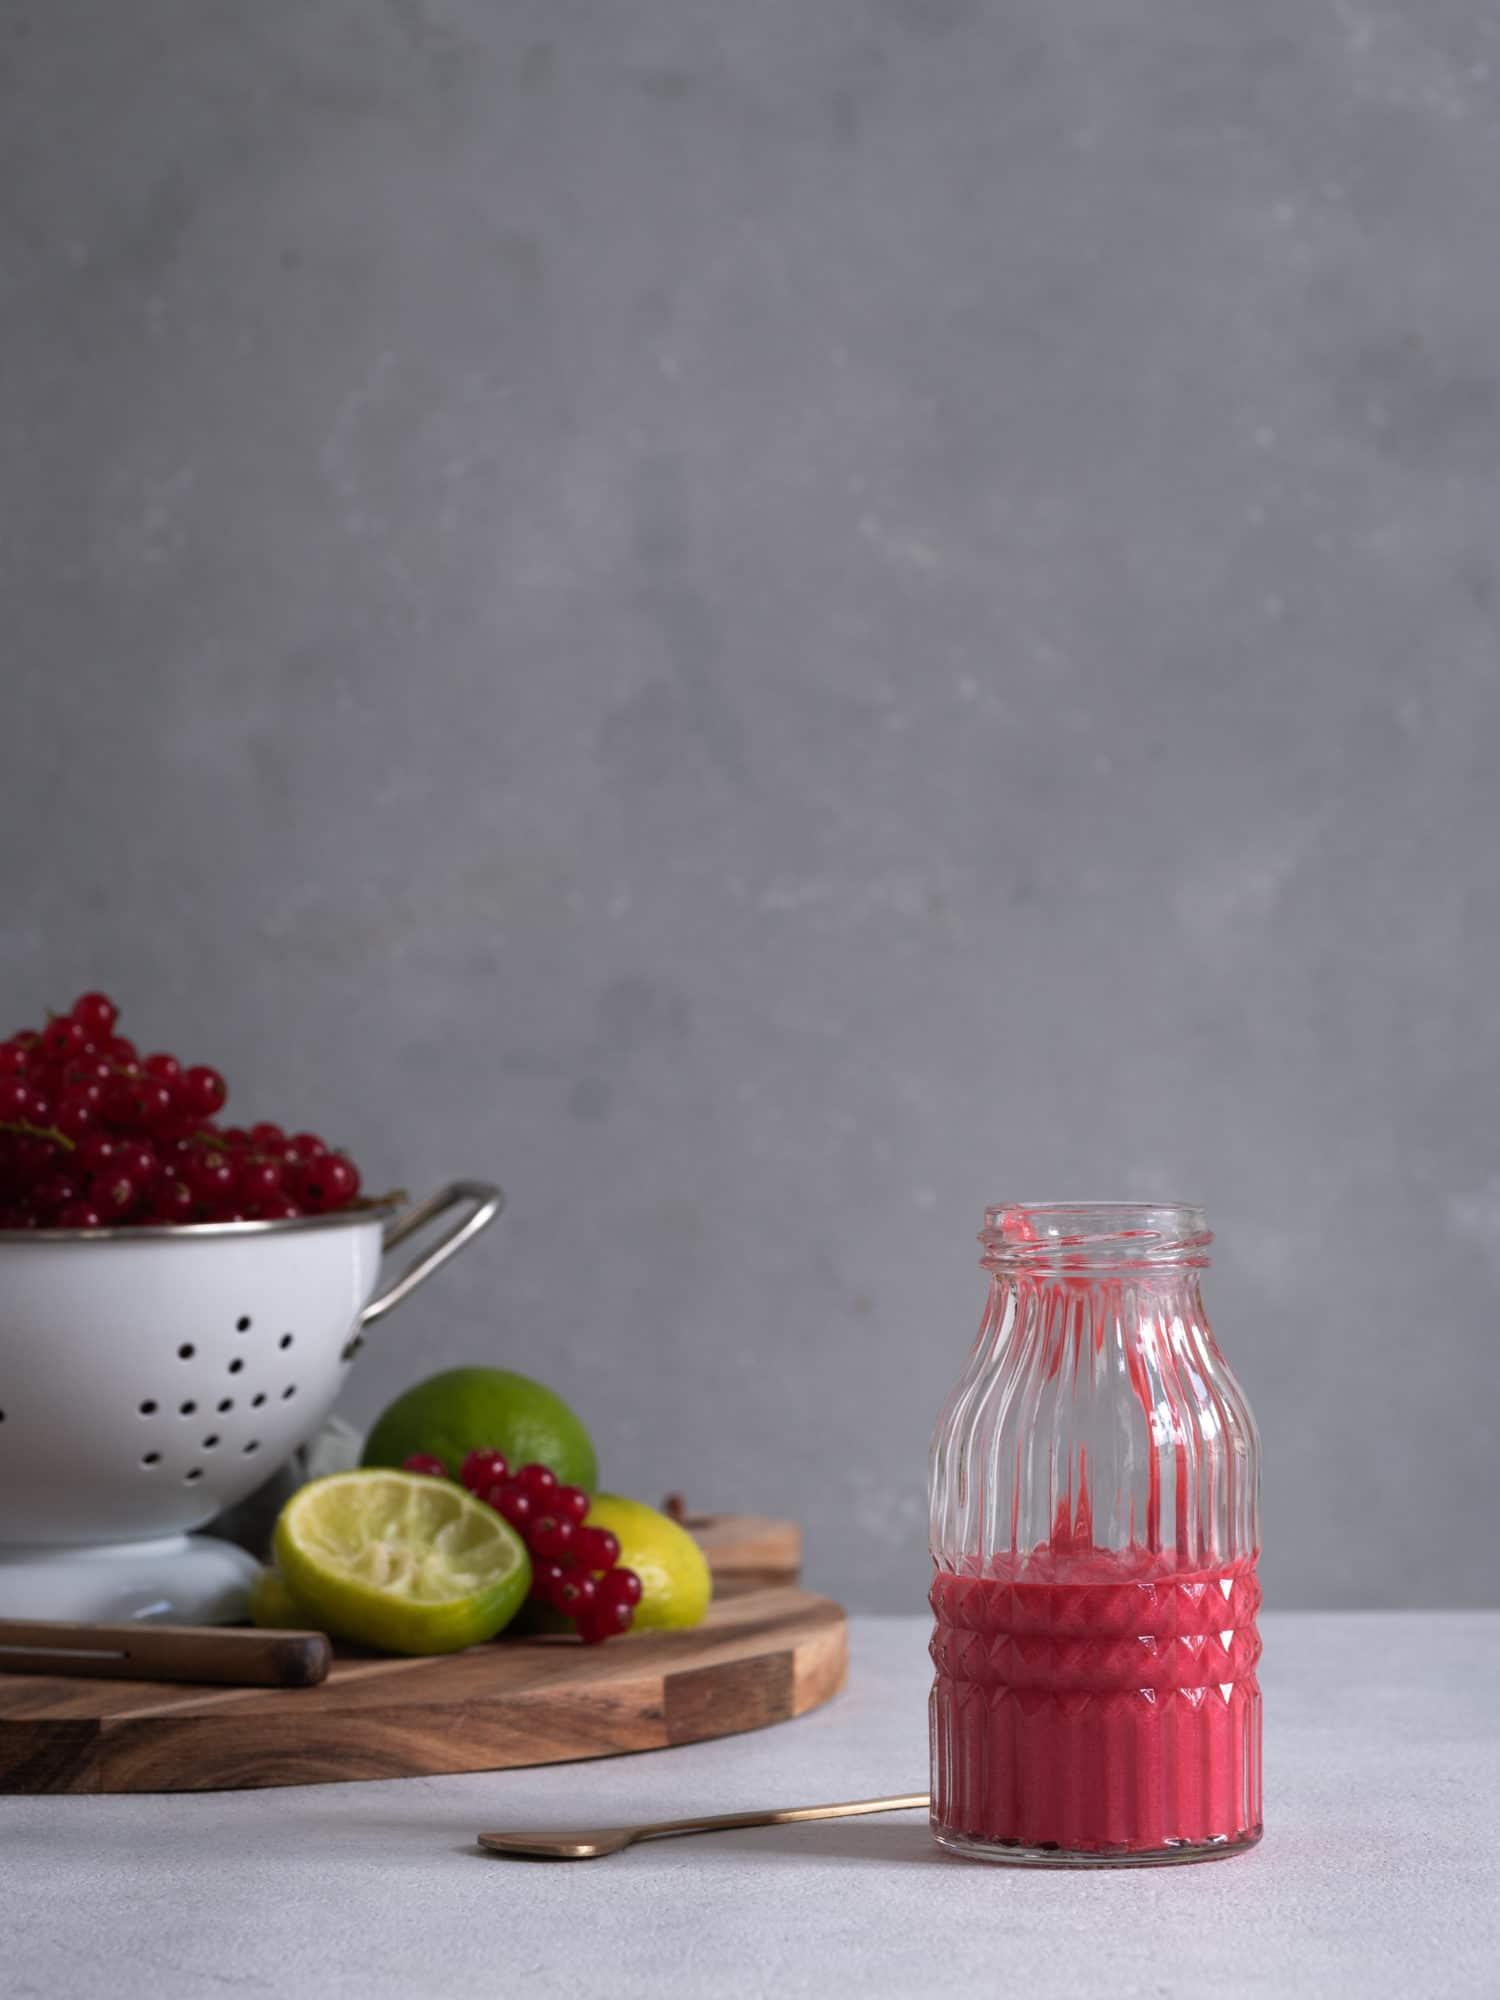 Fruchtpüree zum Limonade selber machen